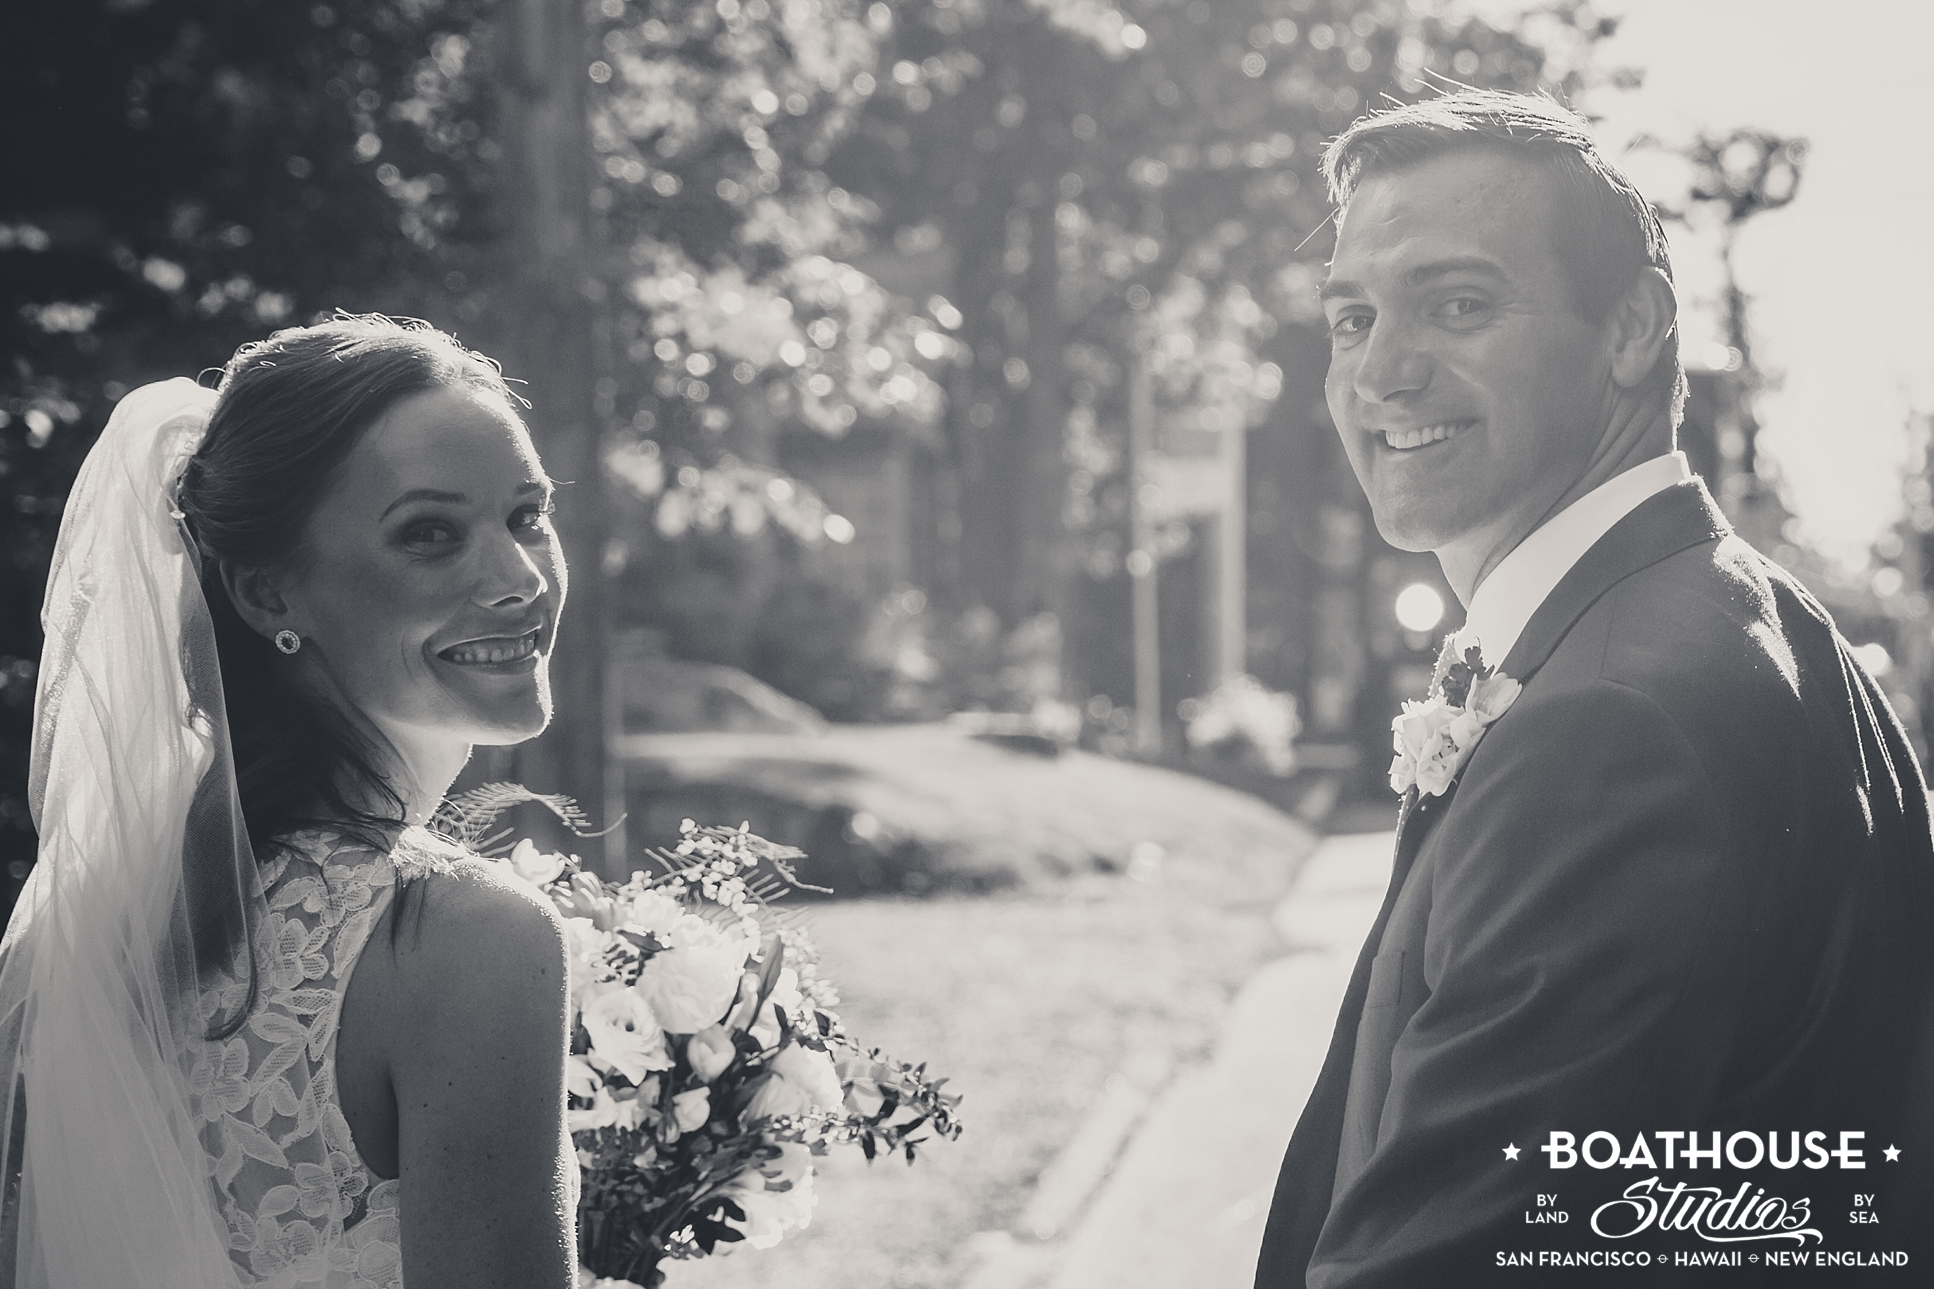 San Francisco Wedding Photographer ©BoathouseStudios.com Wedding, Kids, Family